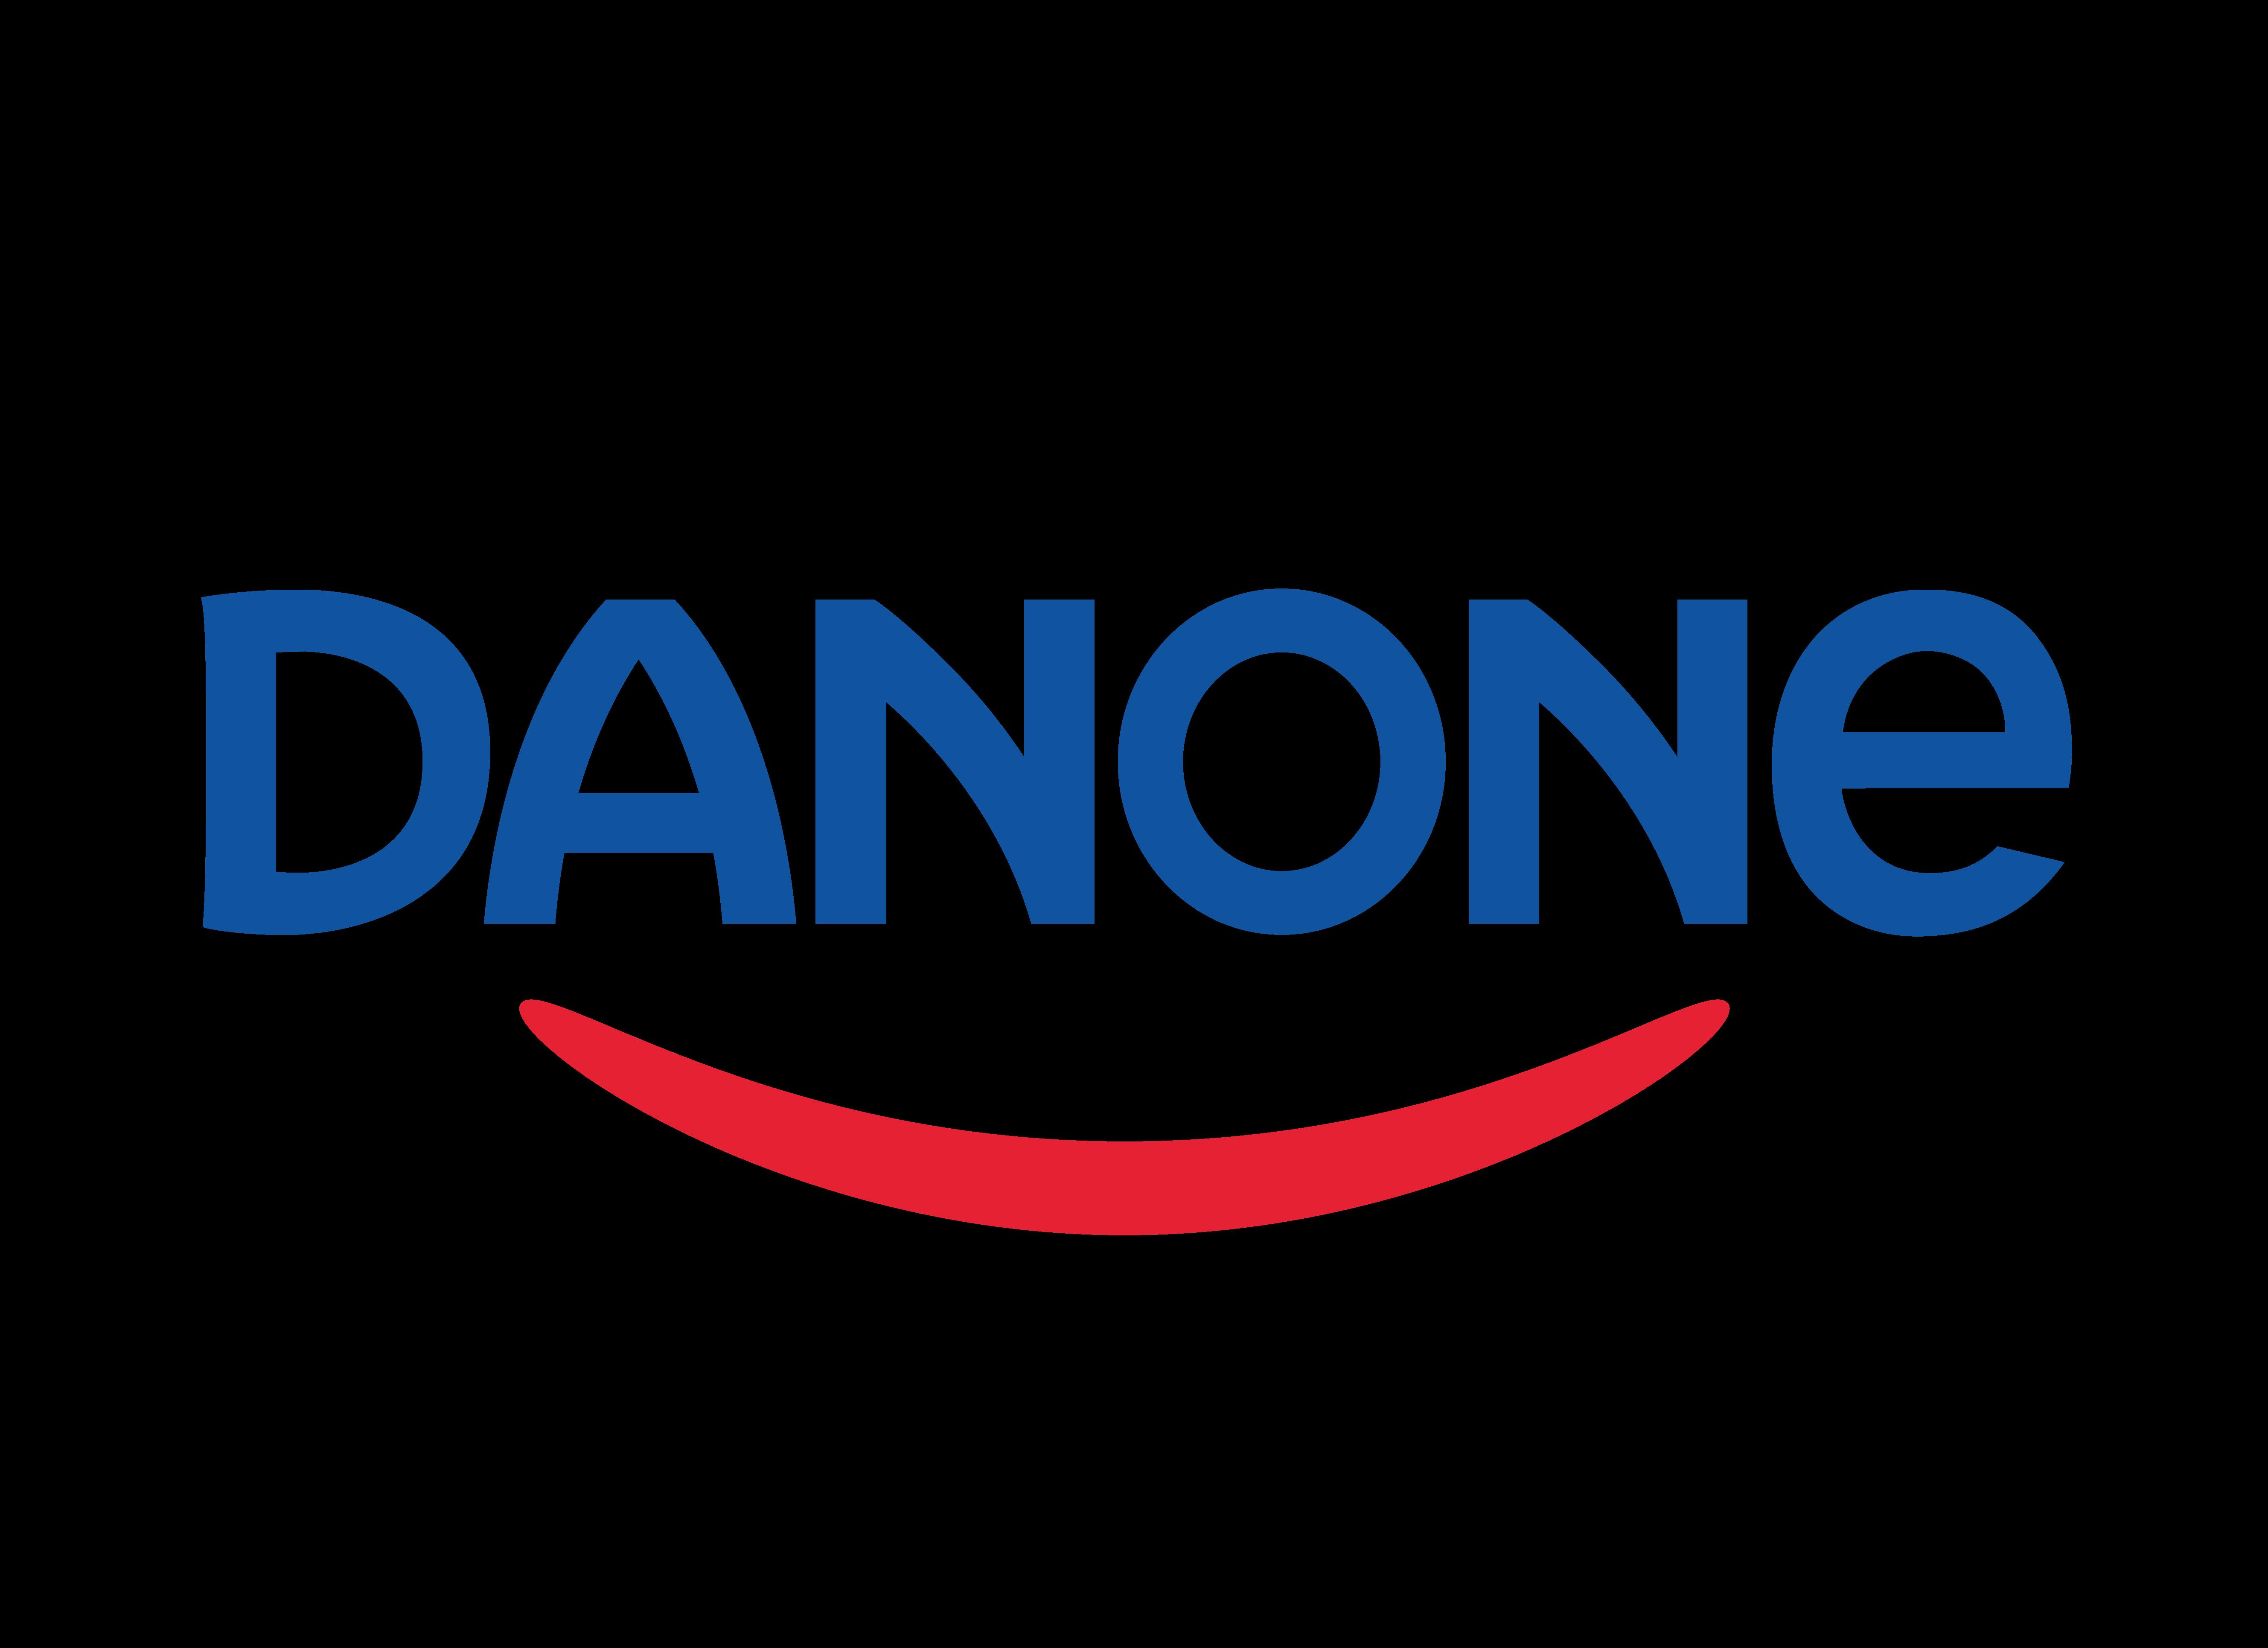 Logo for Danone Dairy Belgium